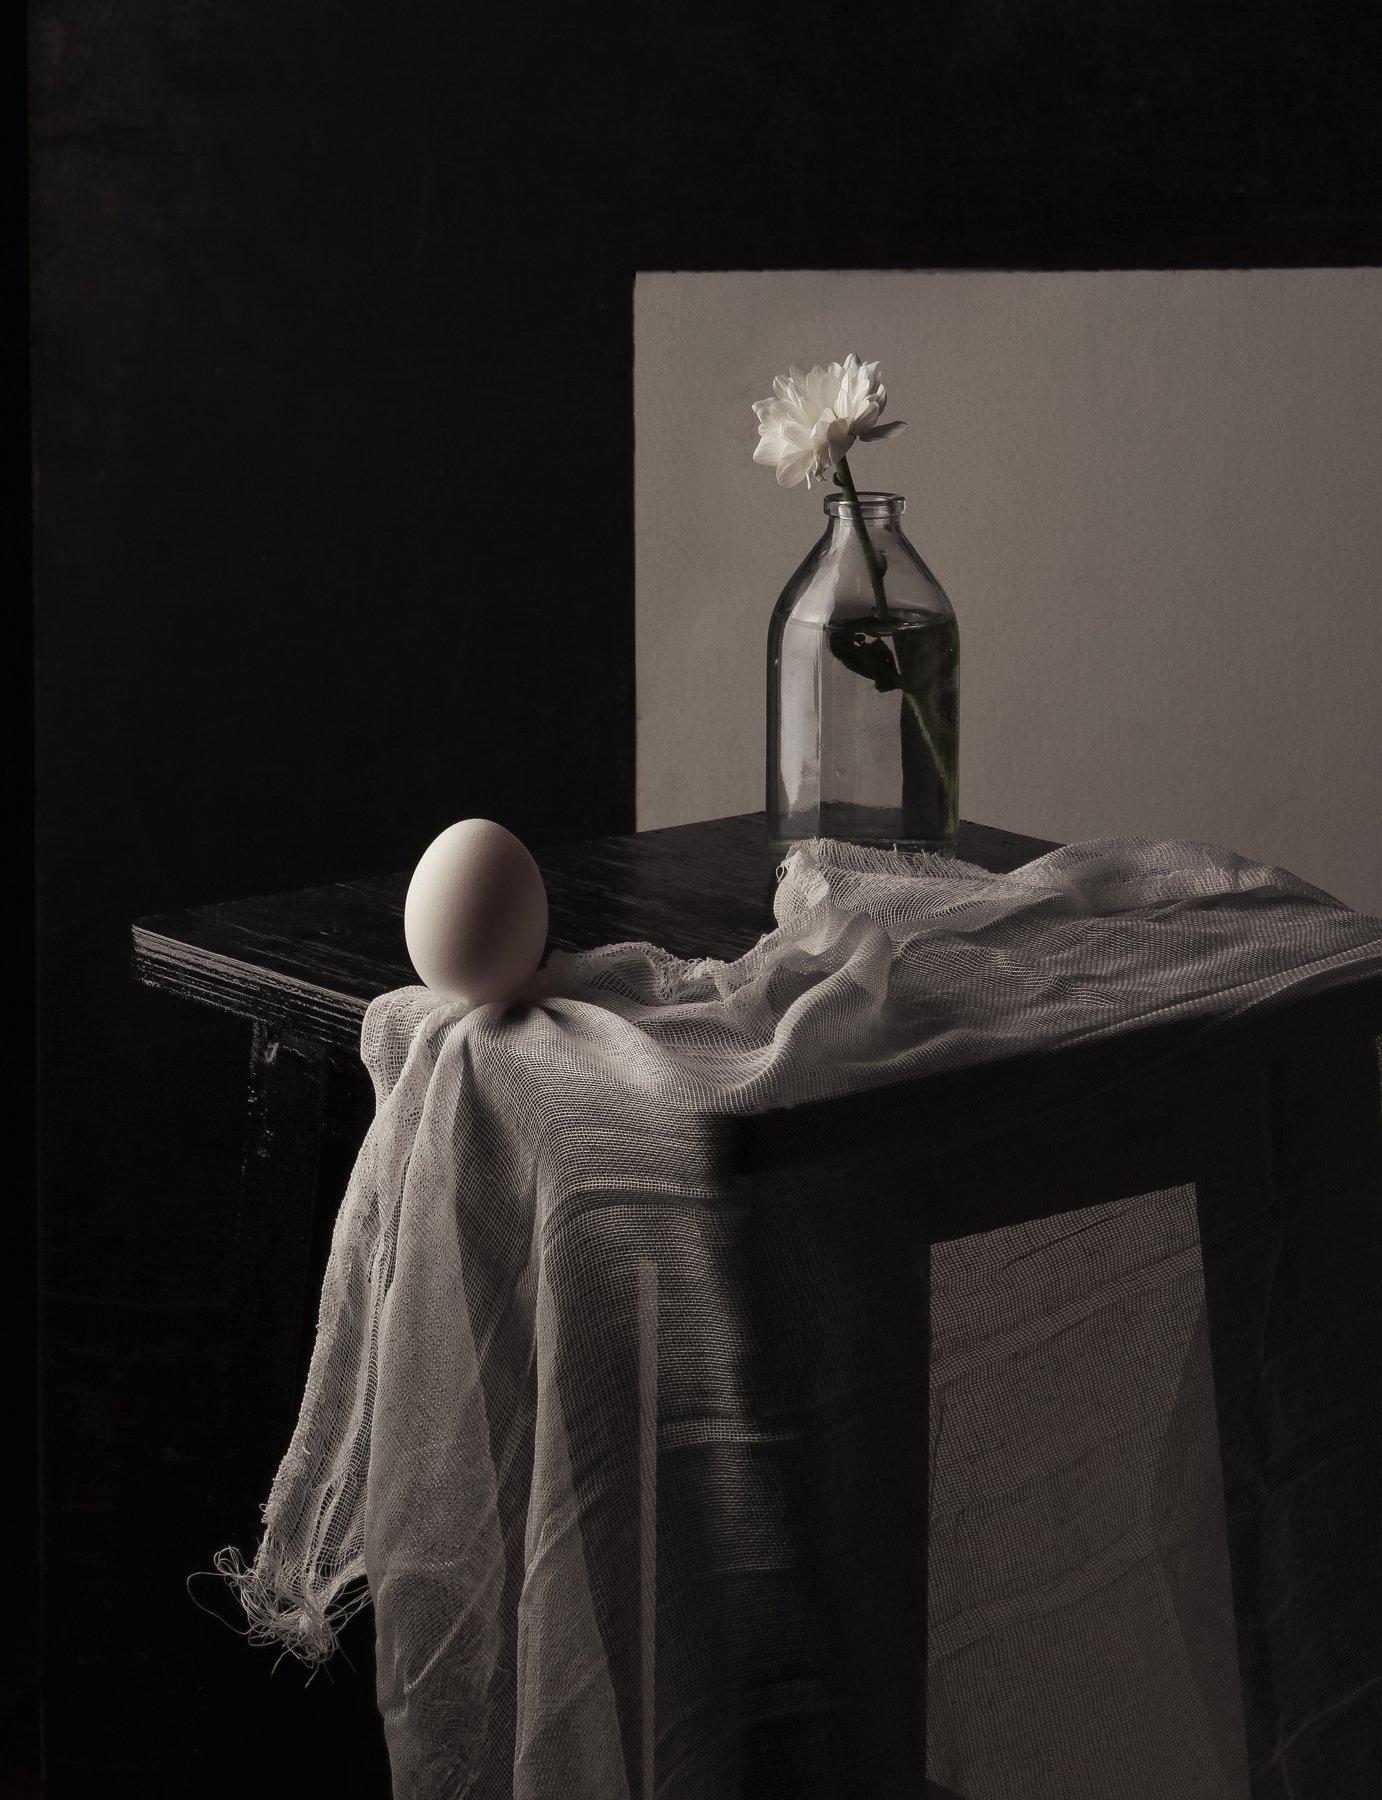 яйцо, стекло, бутылка, цветок, табуретка, натюрморт, Наталья Голубева